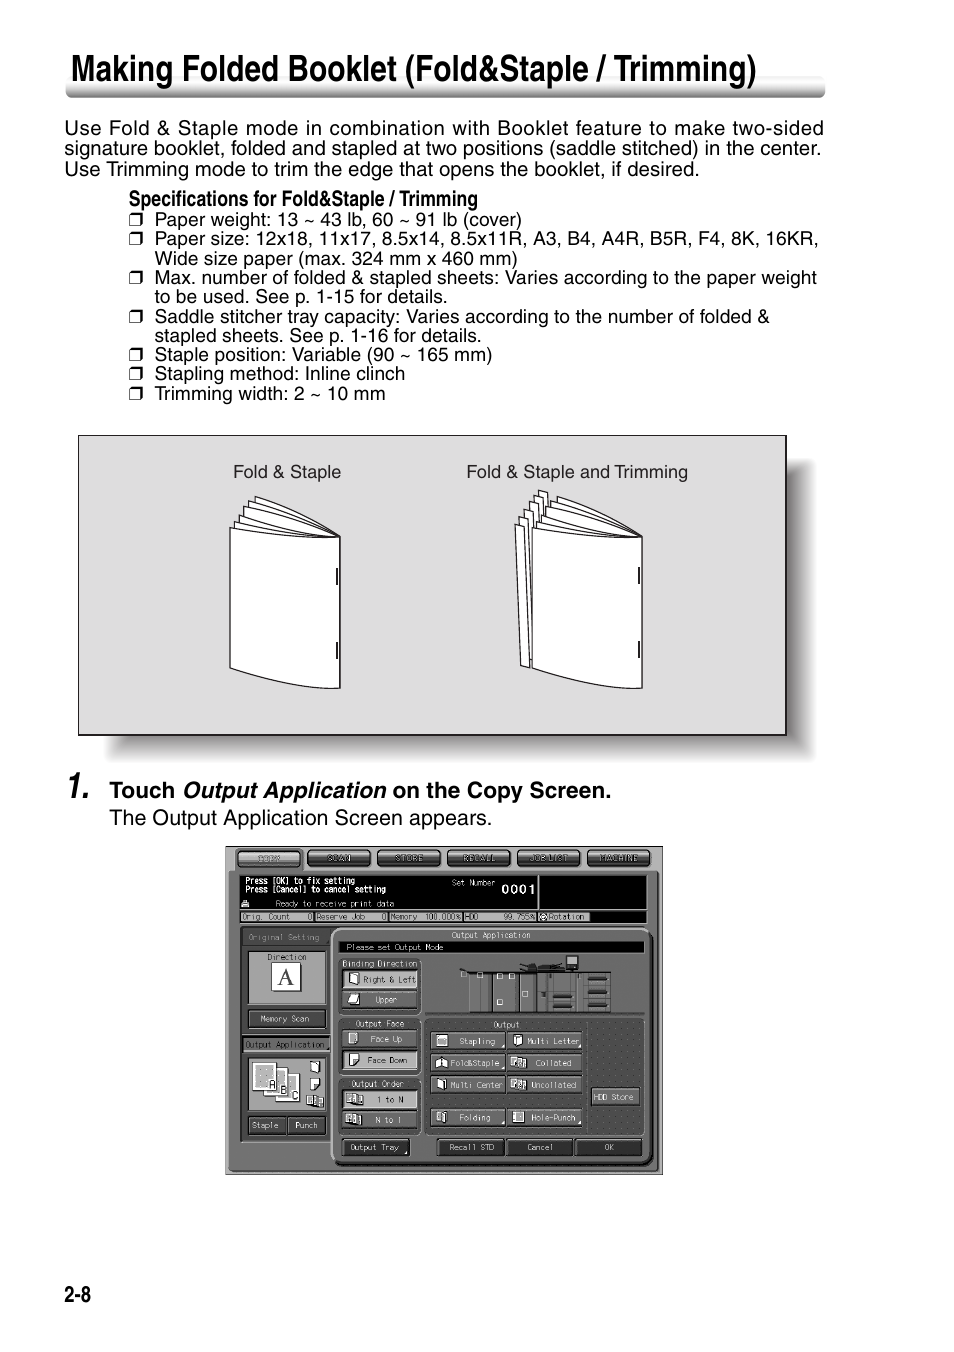 making folded booklet fold staple trimming making folded rh manualsdir com konica minolta user guide network administrator konica minolta user guide network administrator